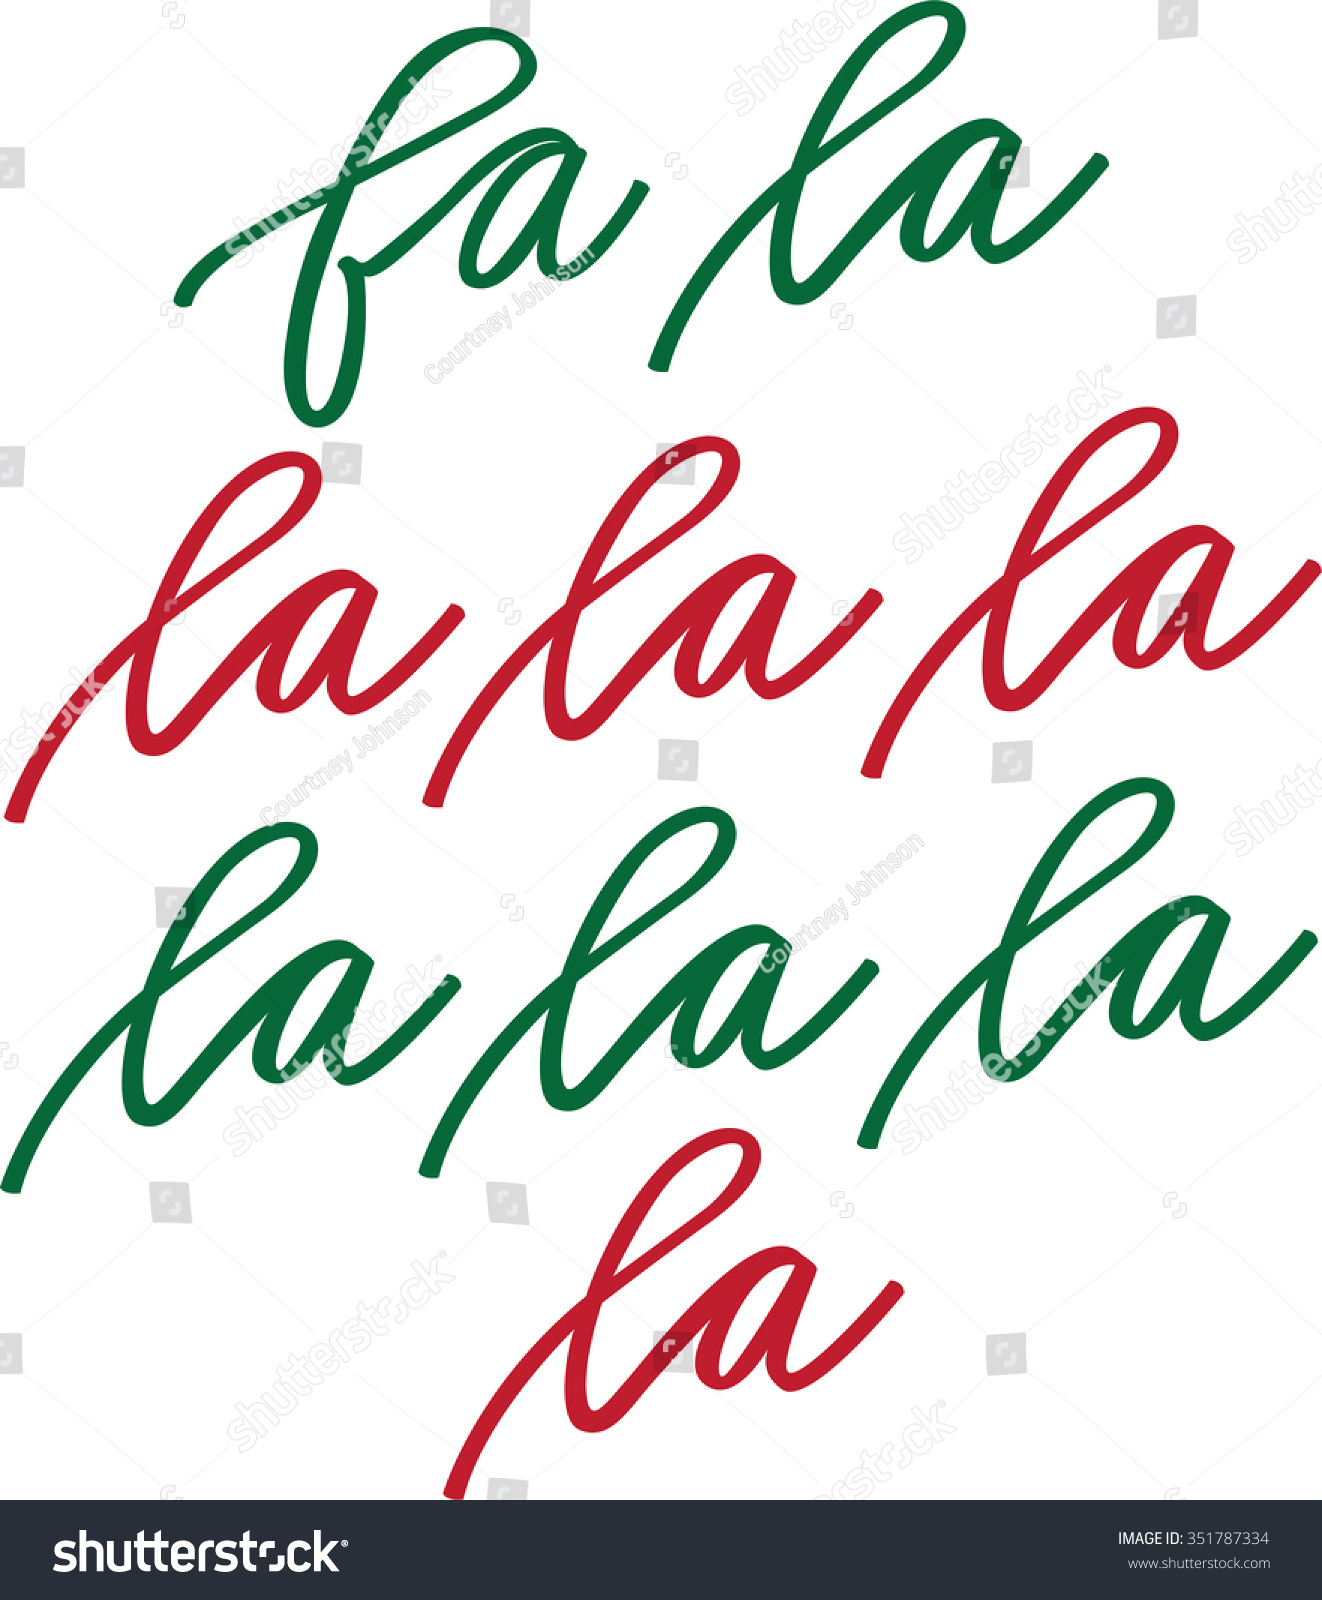 Fa La La La La Stock Vector 351787334 - Shutterstock